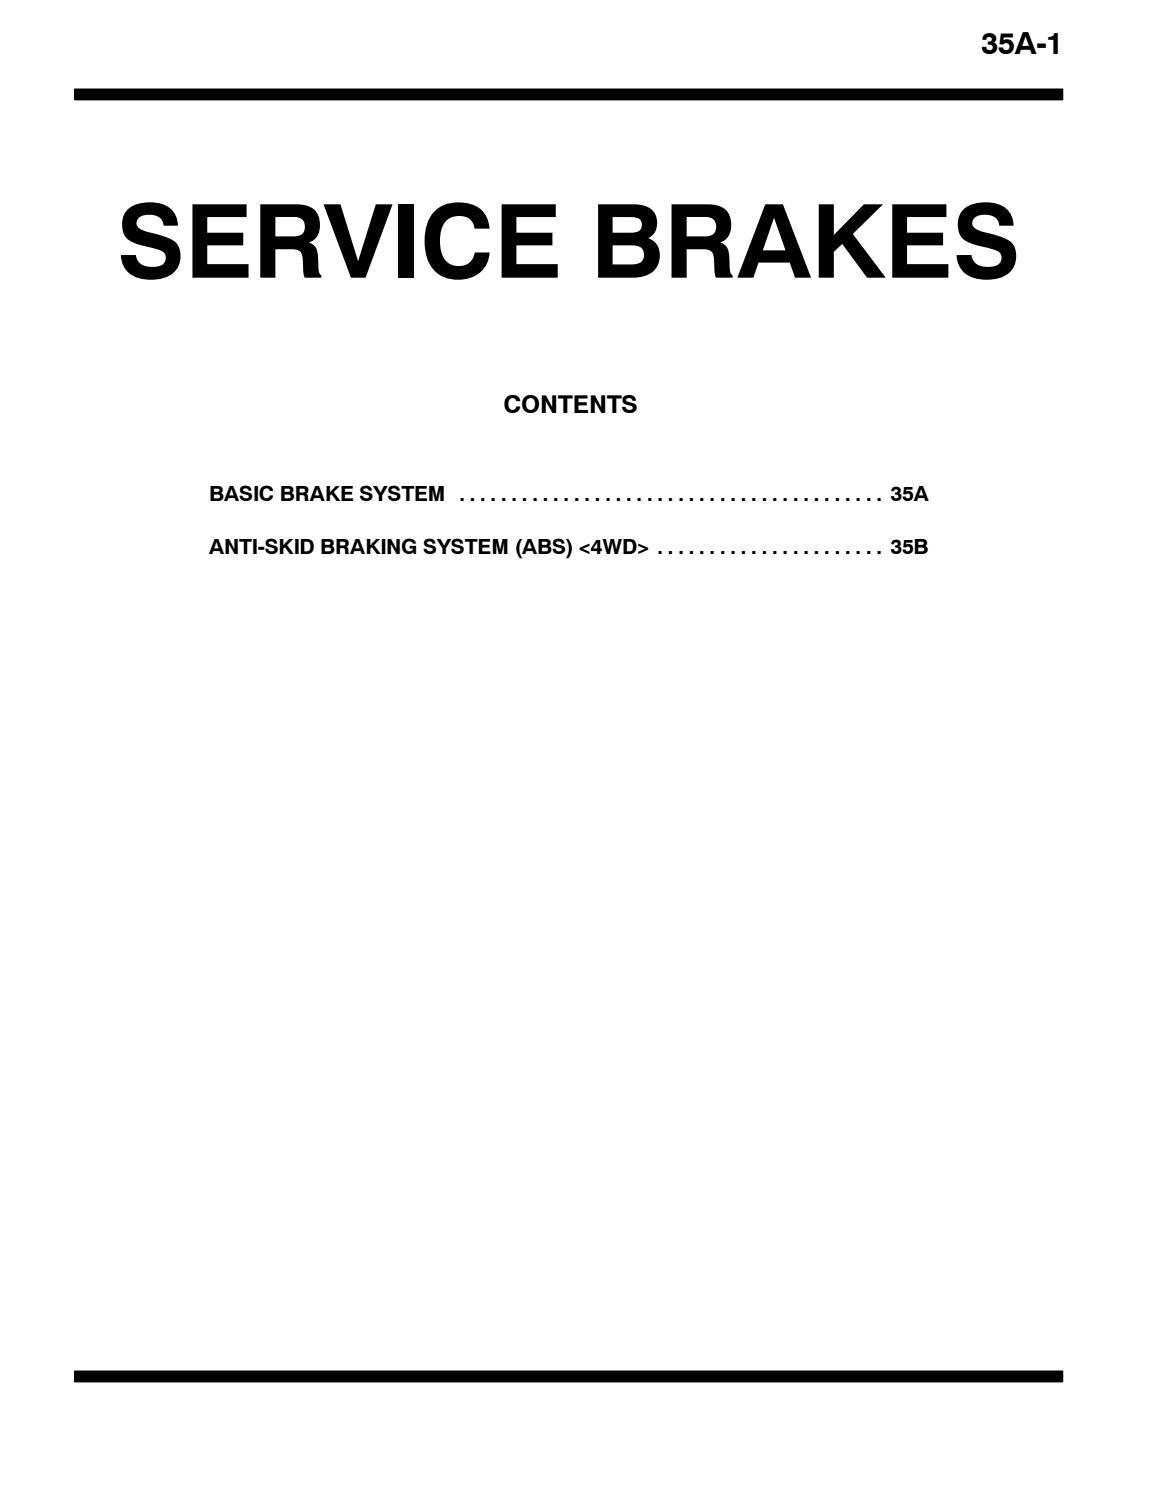 2004 MITSUBISHI MONTERO PAJERO Service Repair Manual by